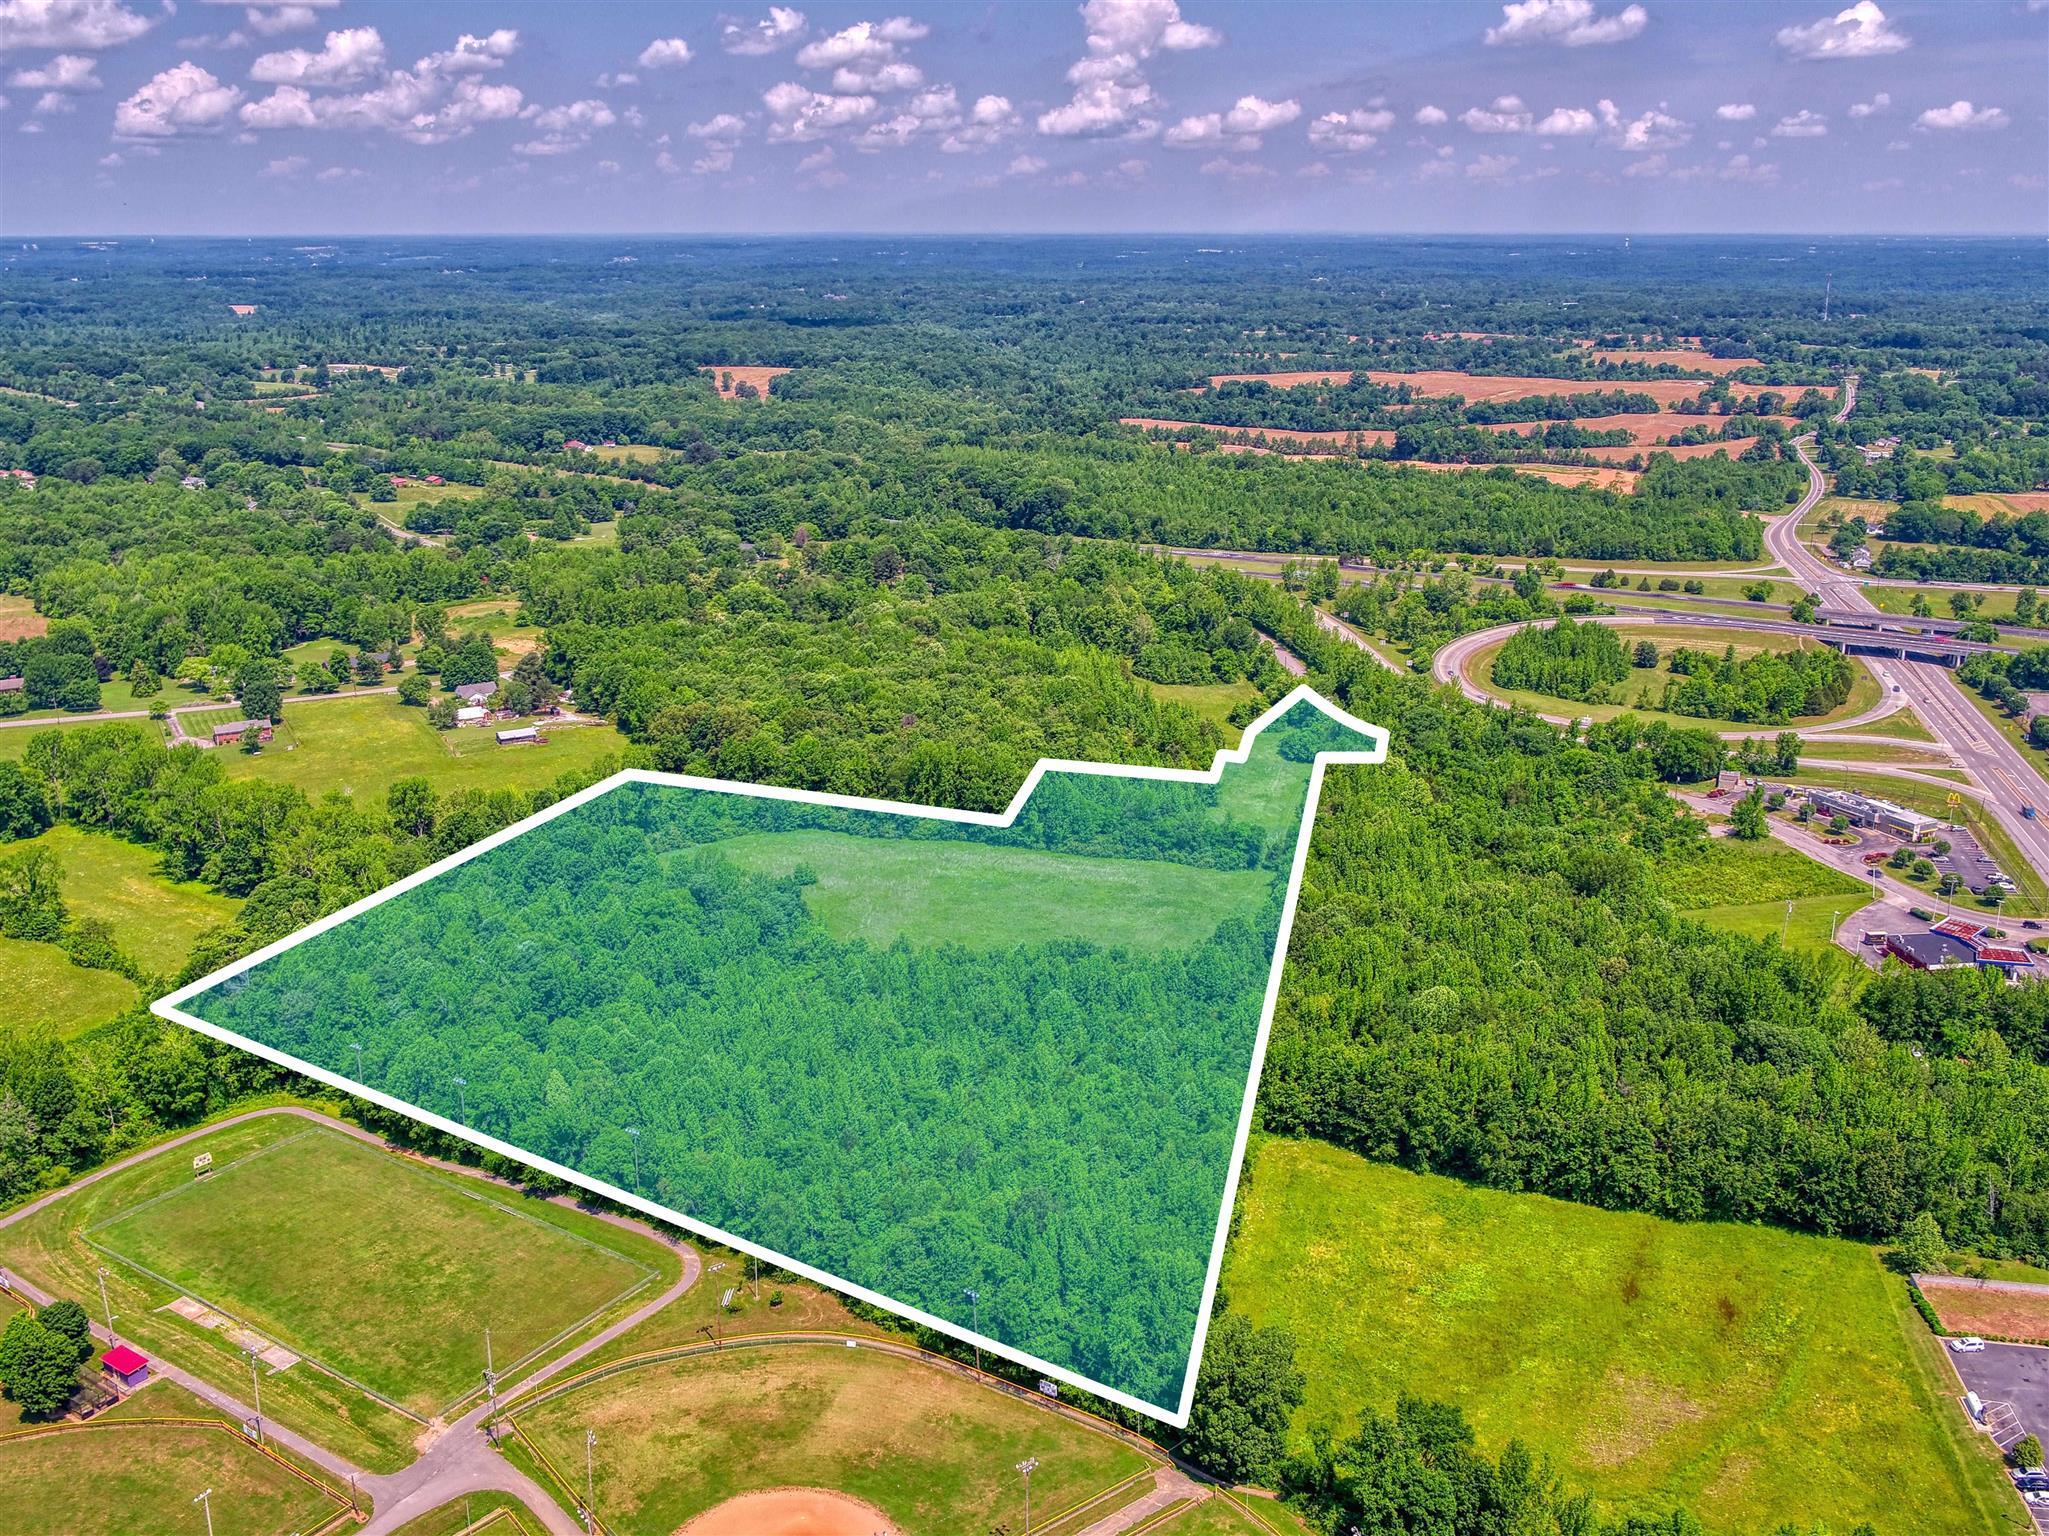 0 Eatons Creek Rd, Joelton, TN 37080 - Joelton, TN real estate listing